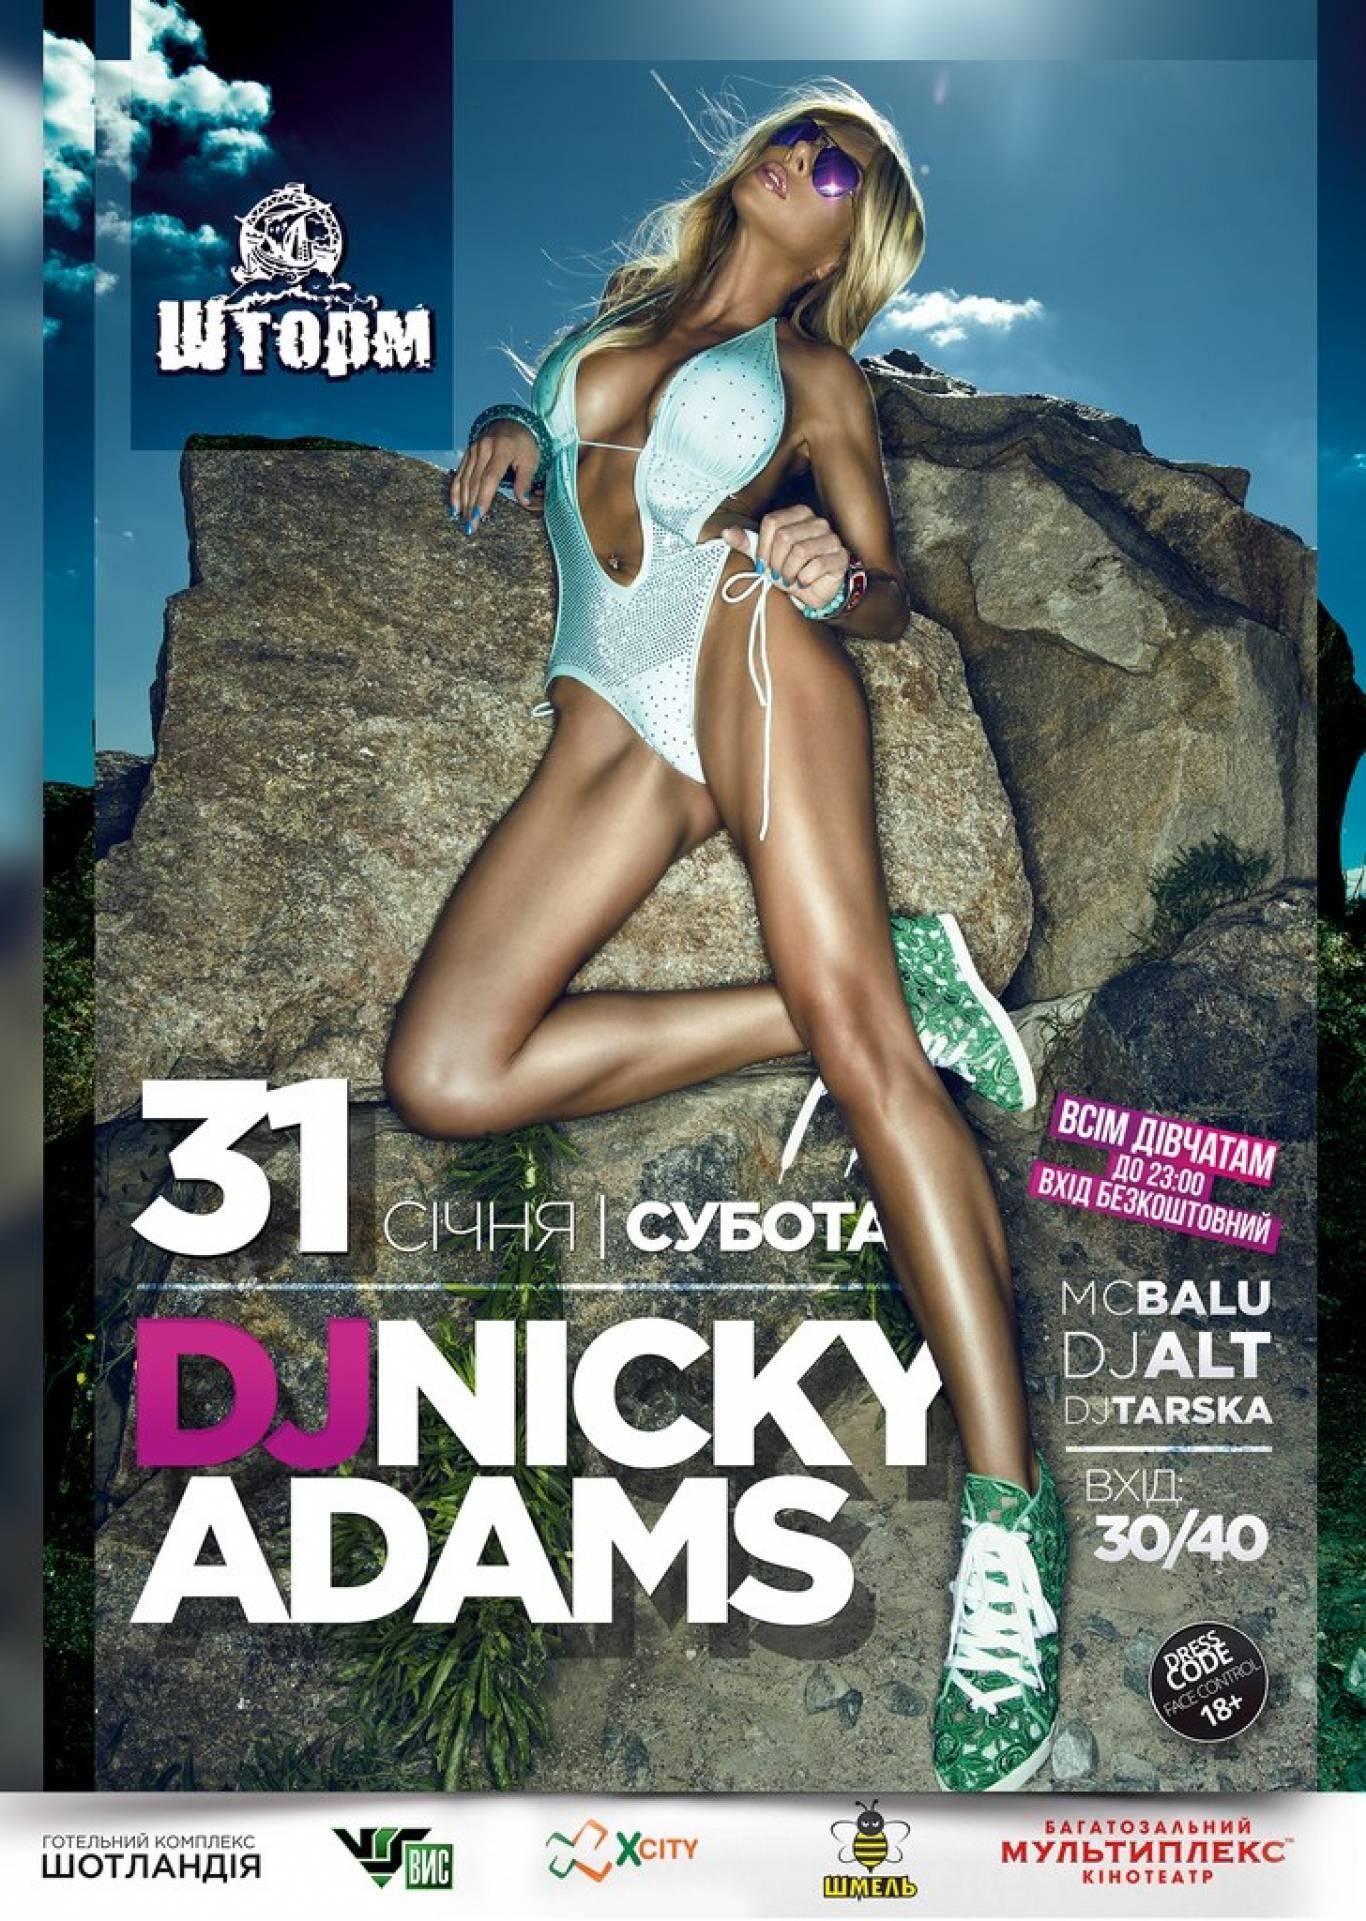 DJ Nicky Adams